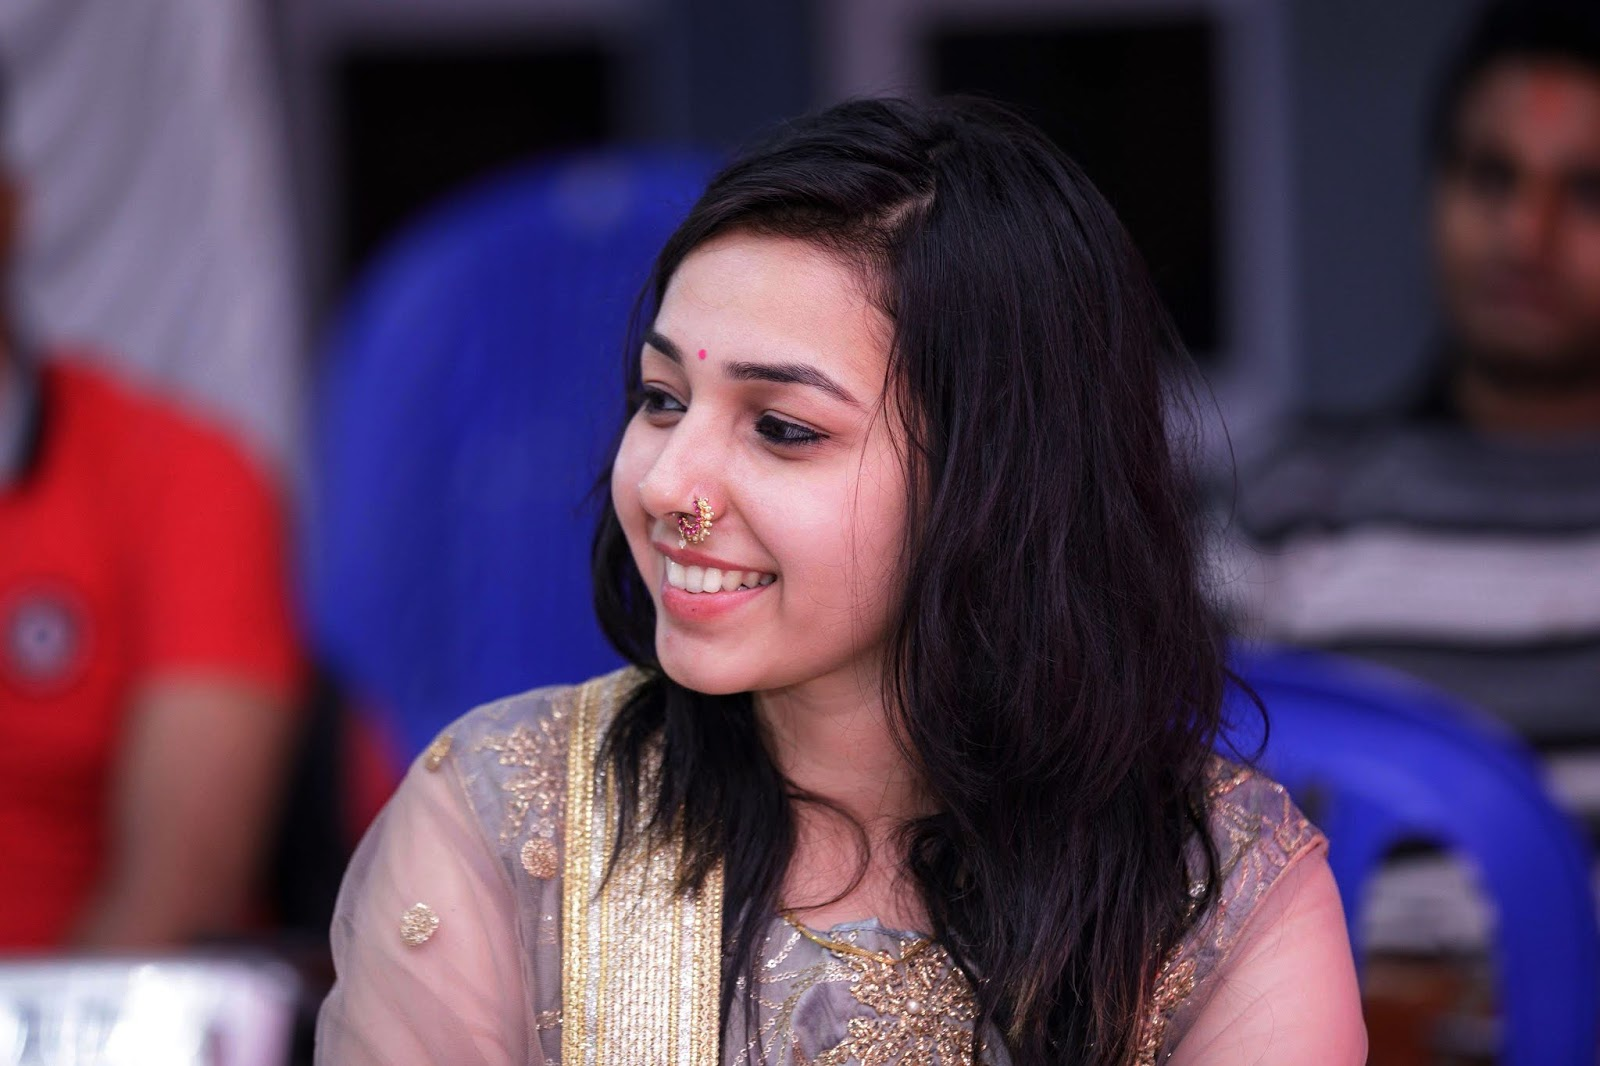 song Shree krishna Govind Hare Murare, 23 years old girl, maanya arora age, biography, wiki, wikipedia, bhajan mp3 download,